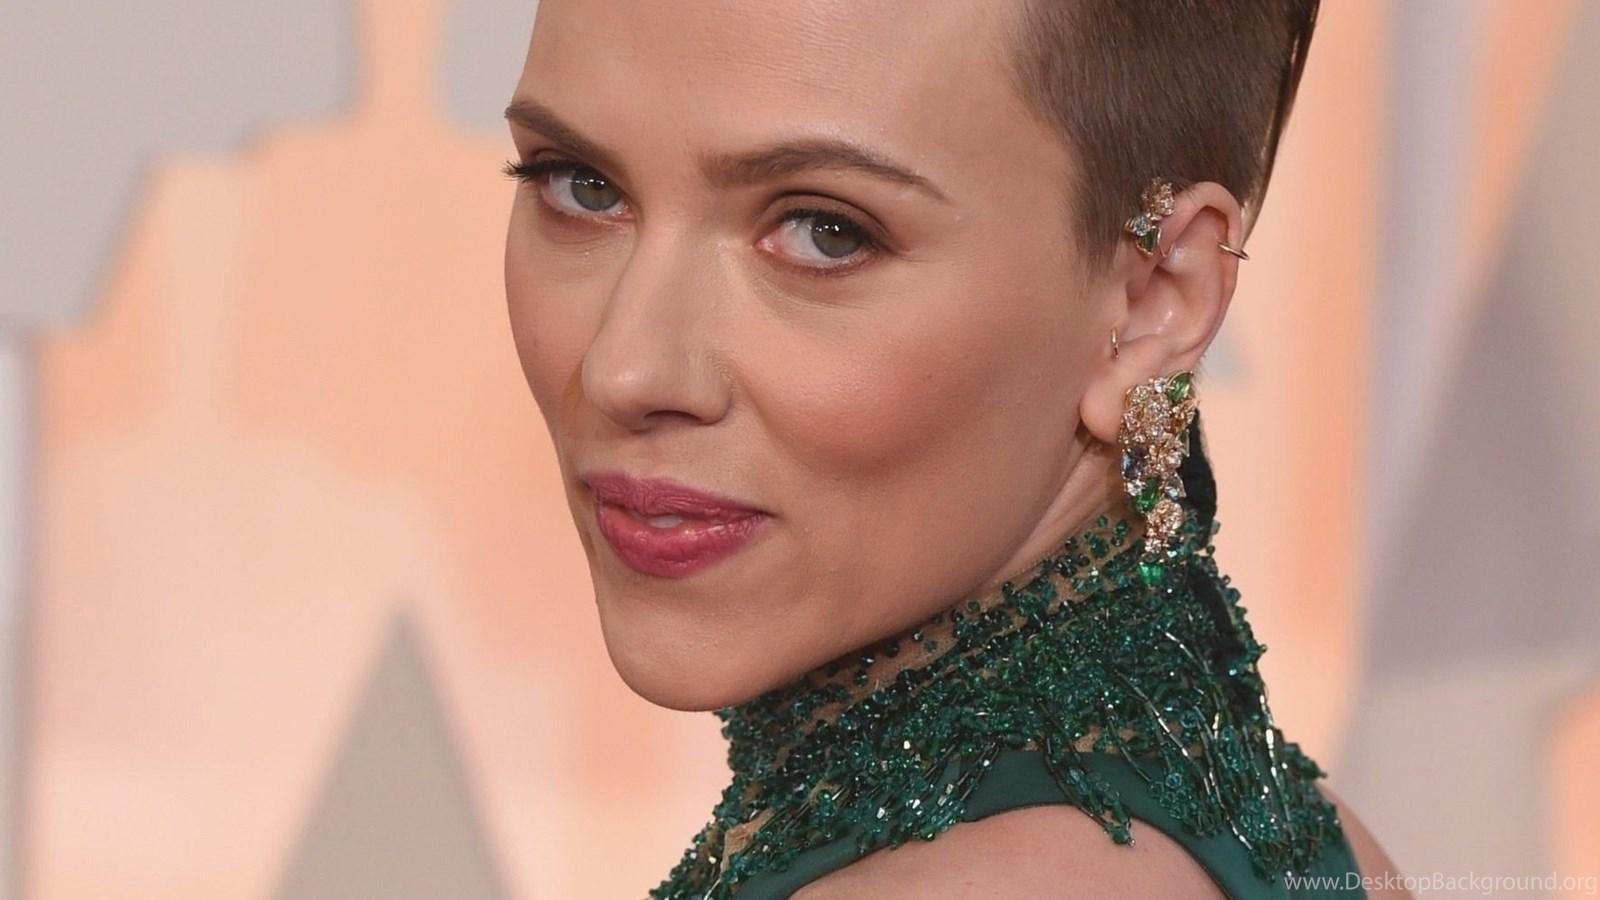 Scarlett Johansson Wallpapers Hd Download Desktop Background